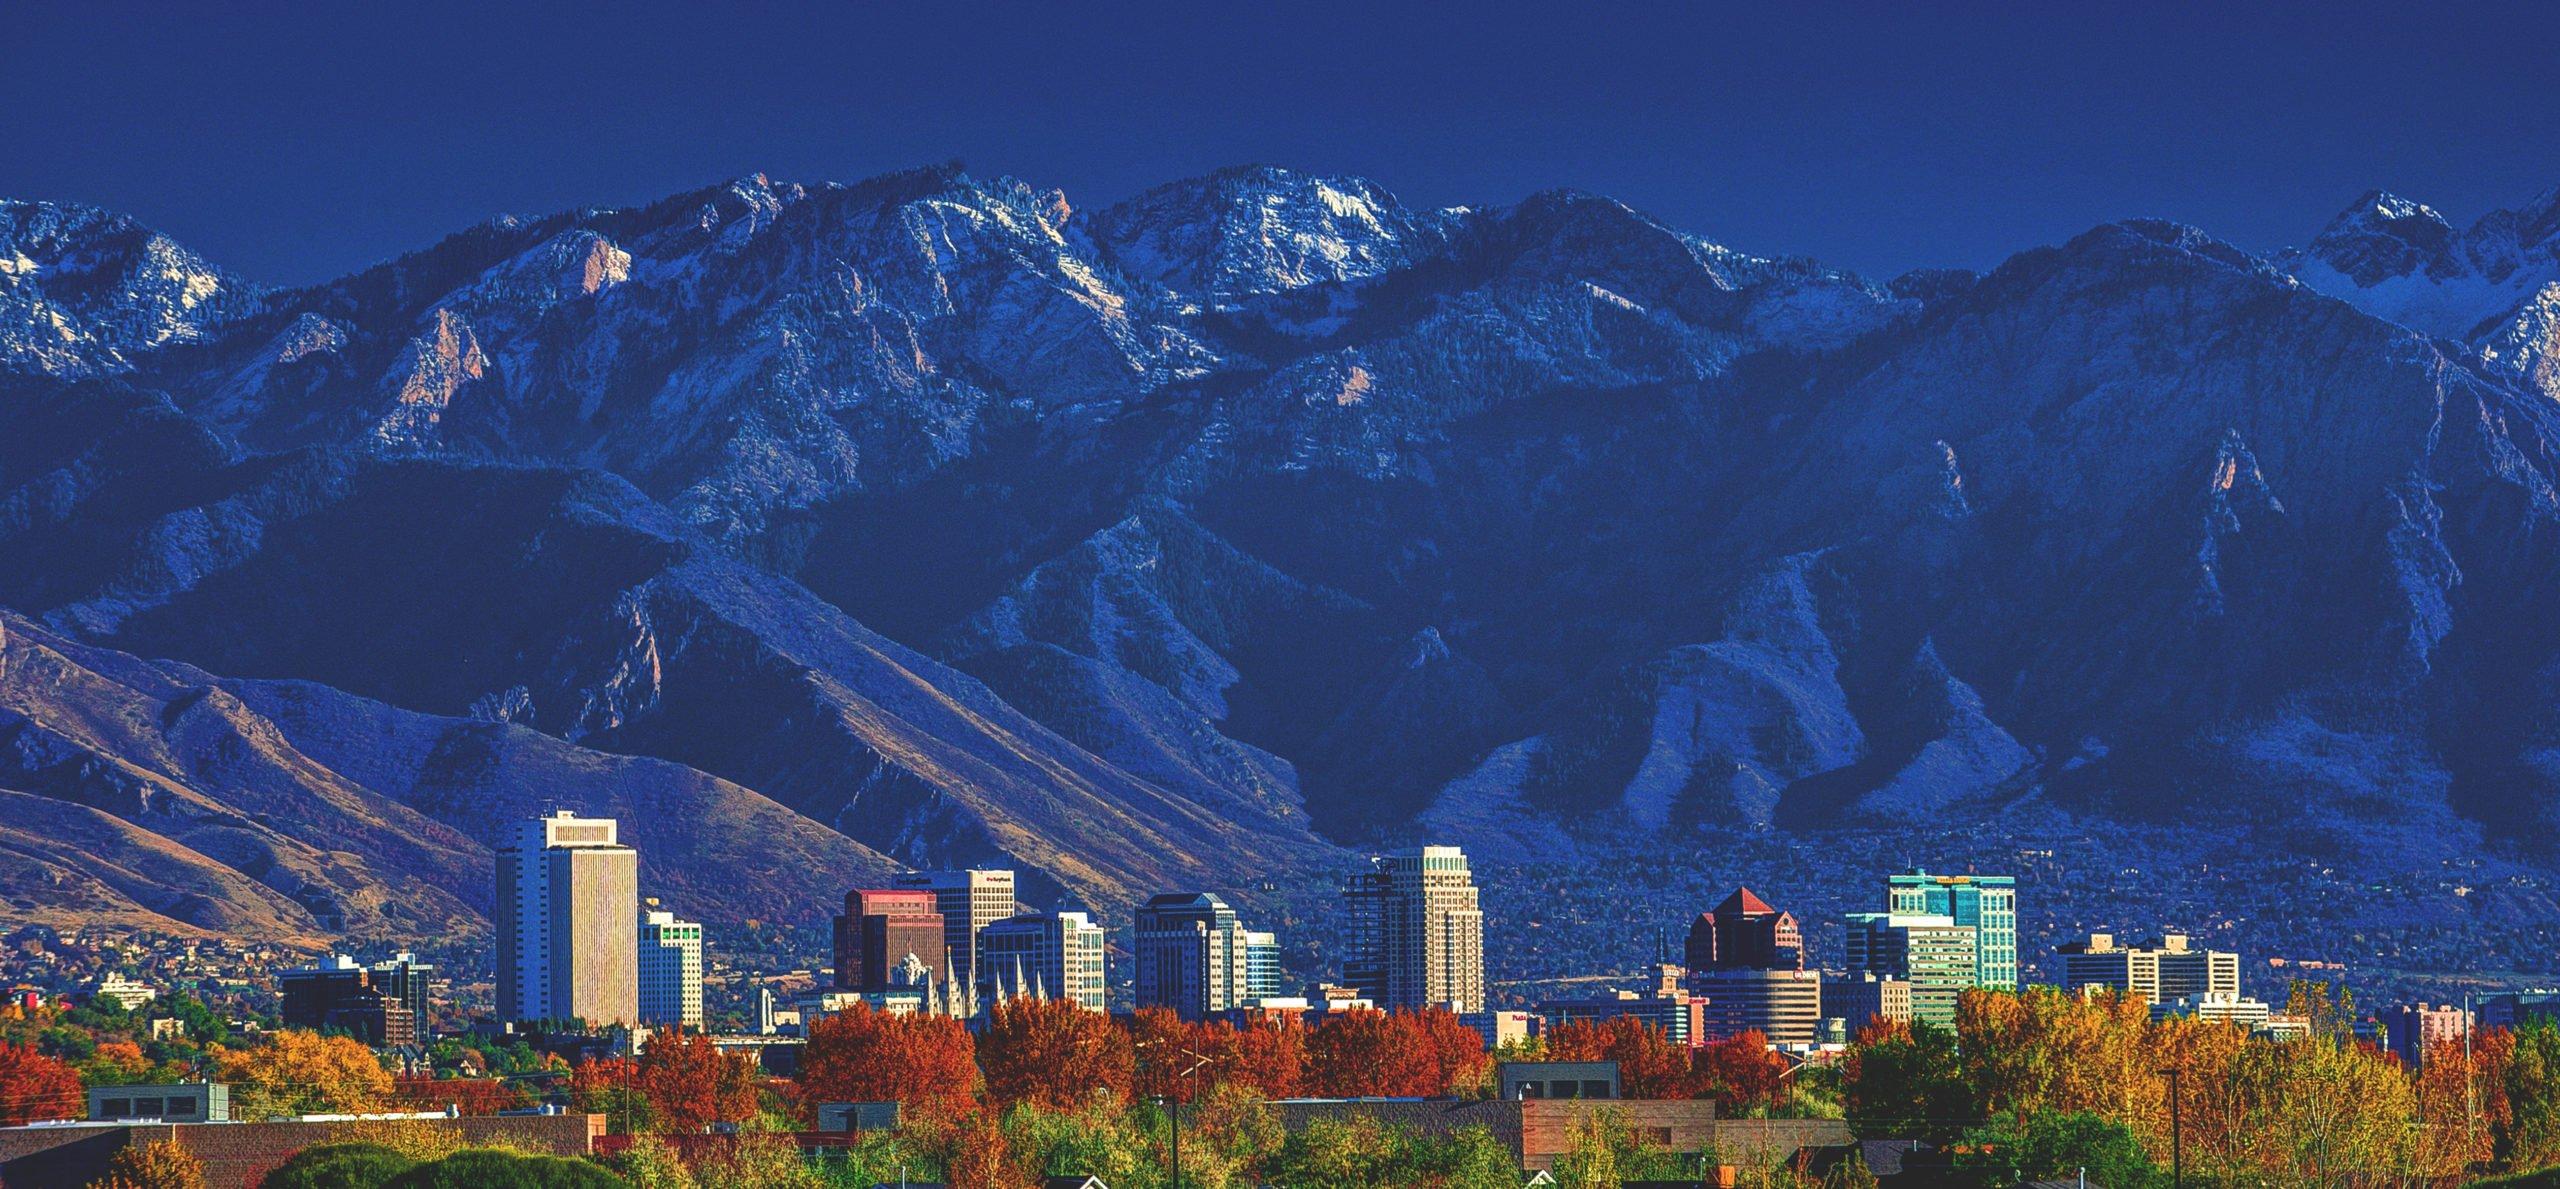 Salt Lake City. From Shutterstock - By Abbie Warnock-Matthews